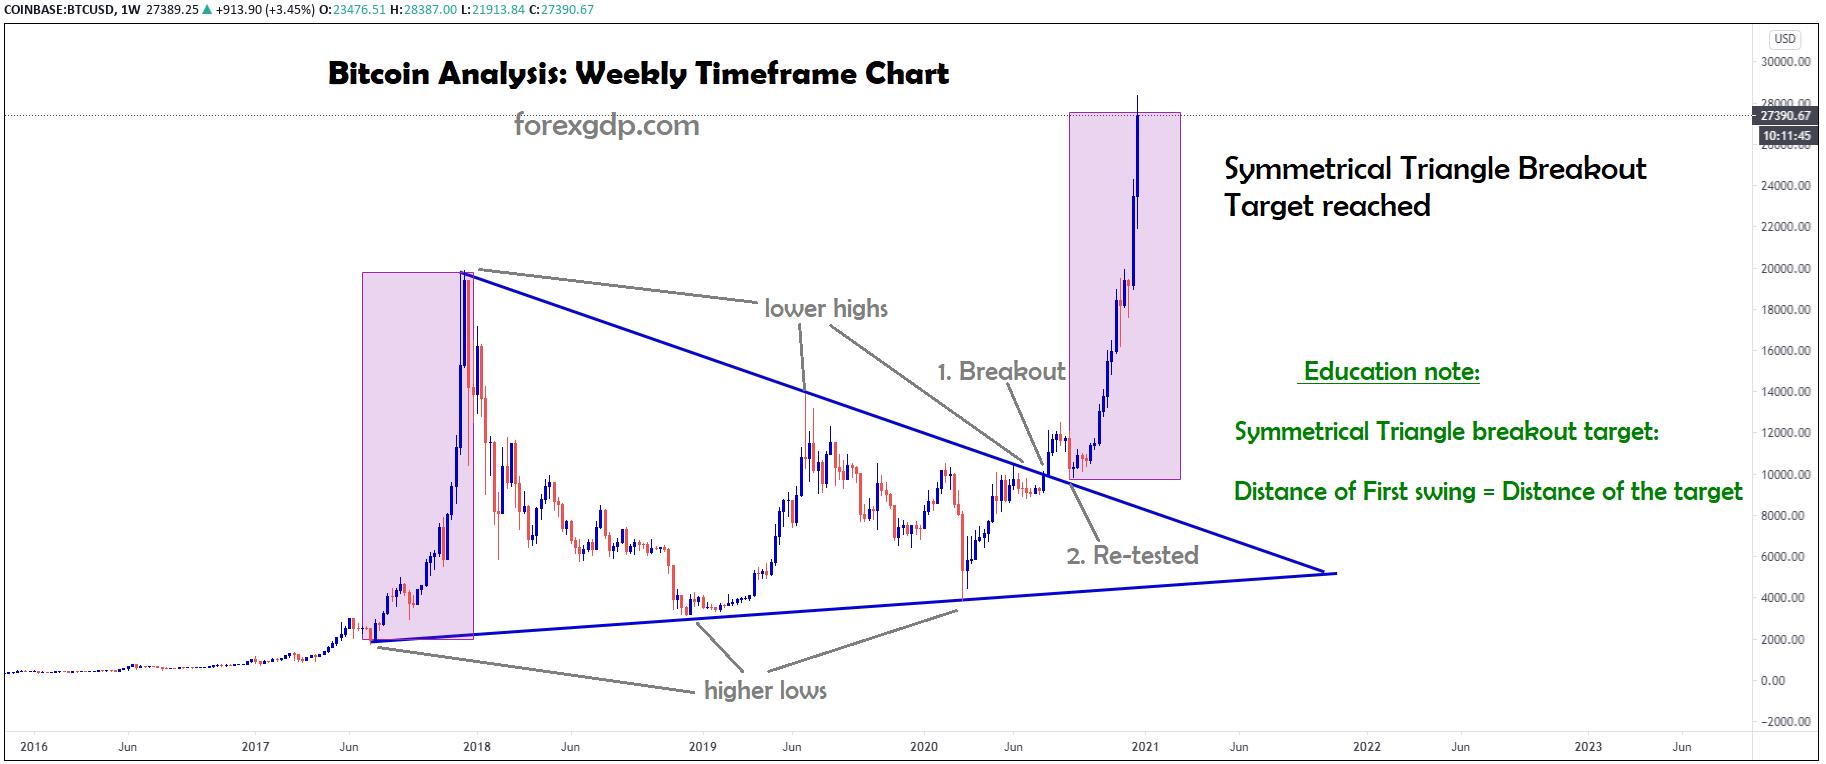 bitcoin price analysis on breakout of symmetrical triangle